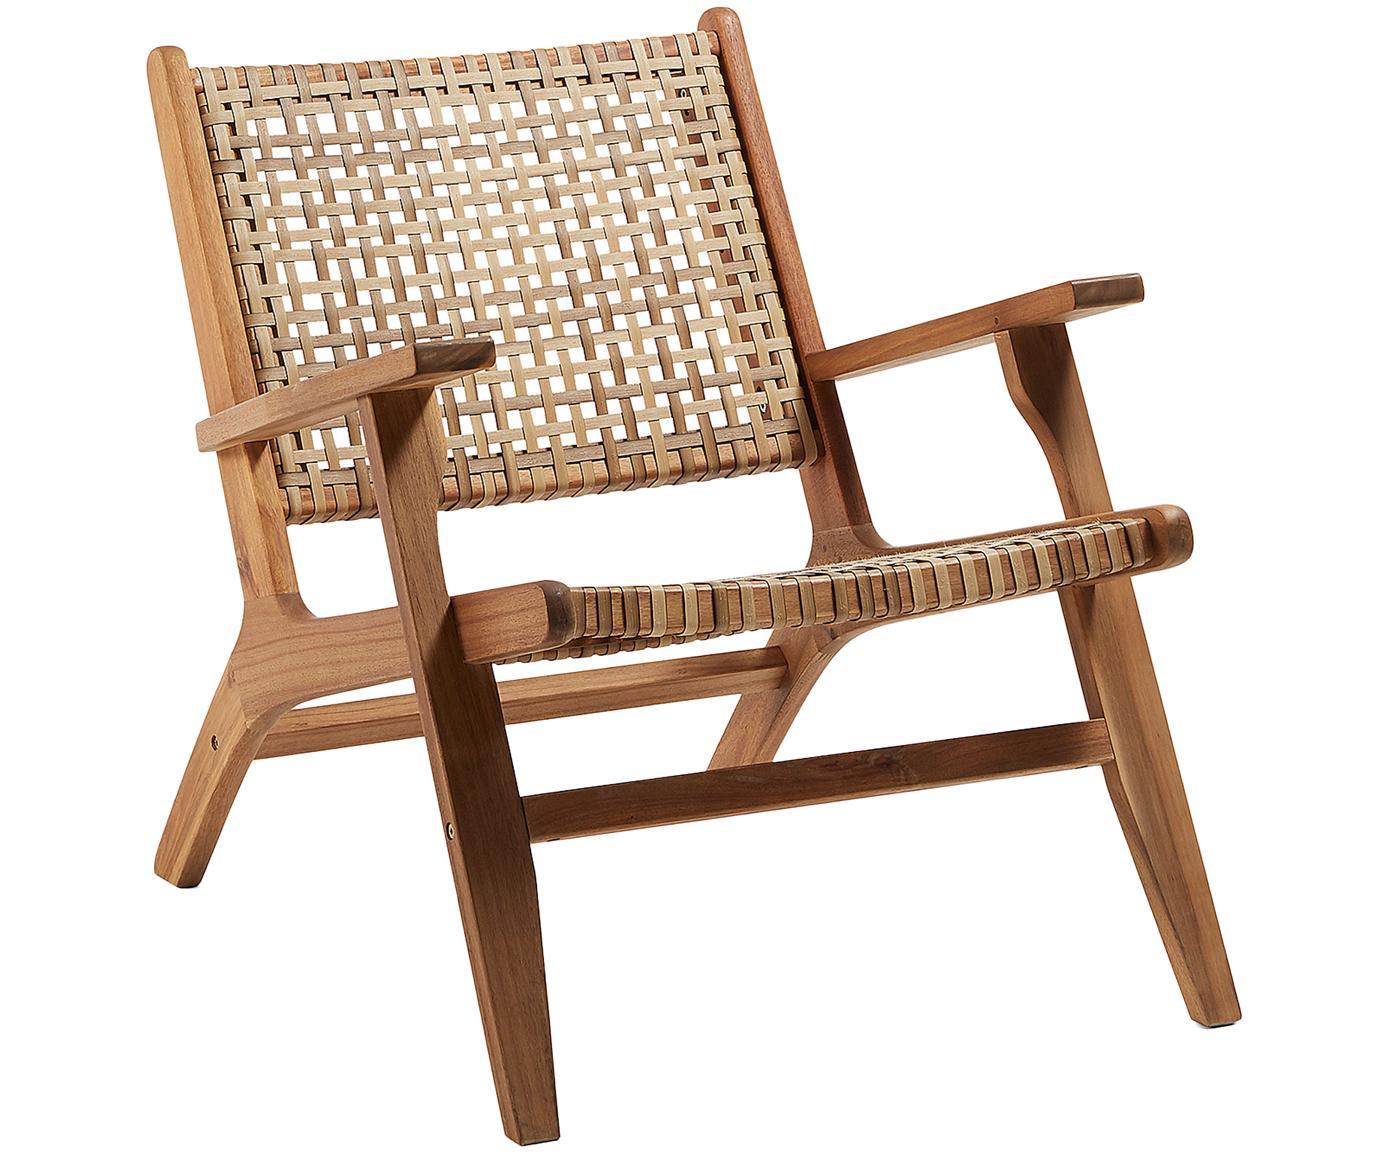 Loungefauteuil Grignoon met rotan vlechtwerk, Frame: massief acaciahout, Acaciahoutkleurig, beige, B 68 x D 80 cm